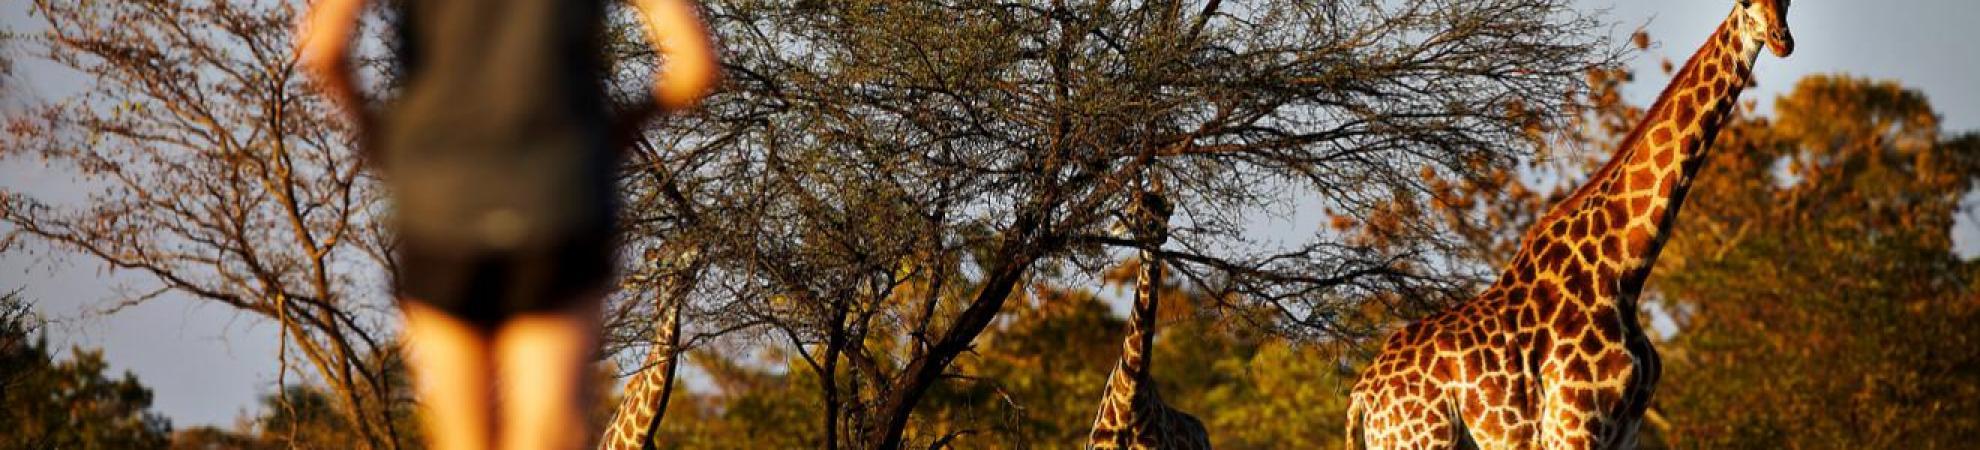 worlds quirkiest events SouthAfrica_BigFiveMarathon_RunnerAndGiraffe_045